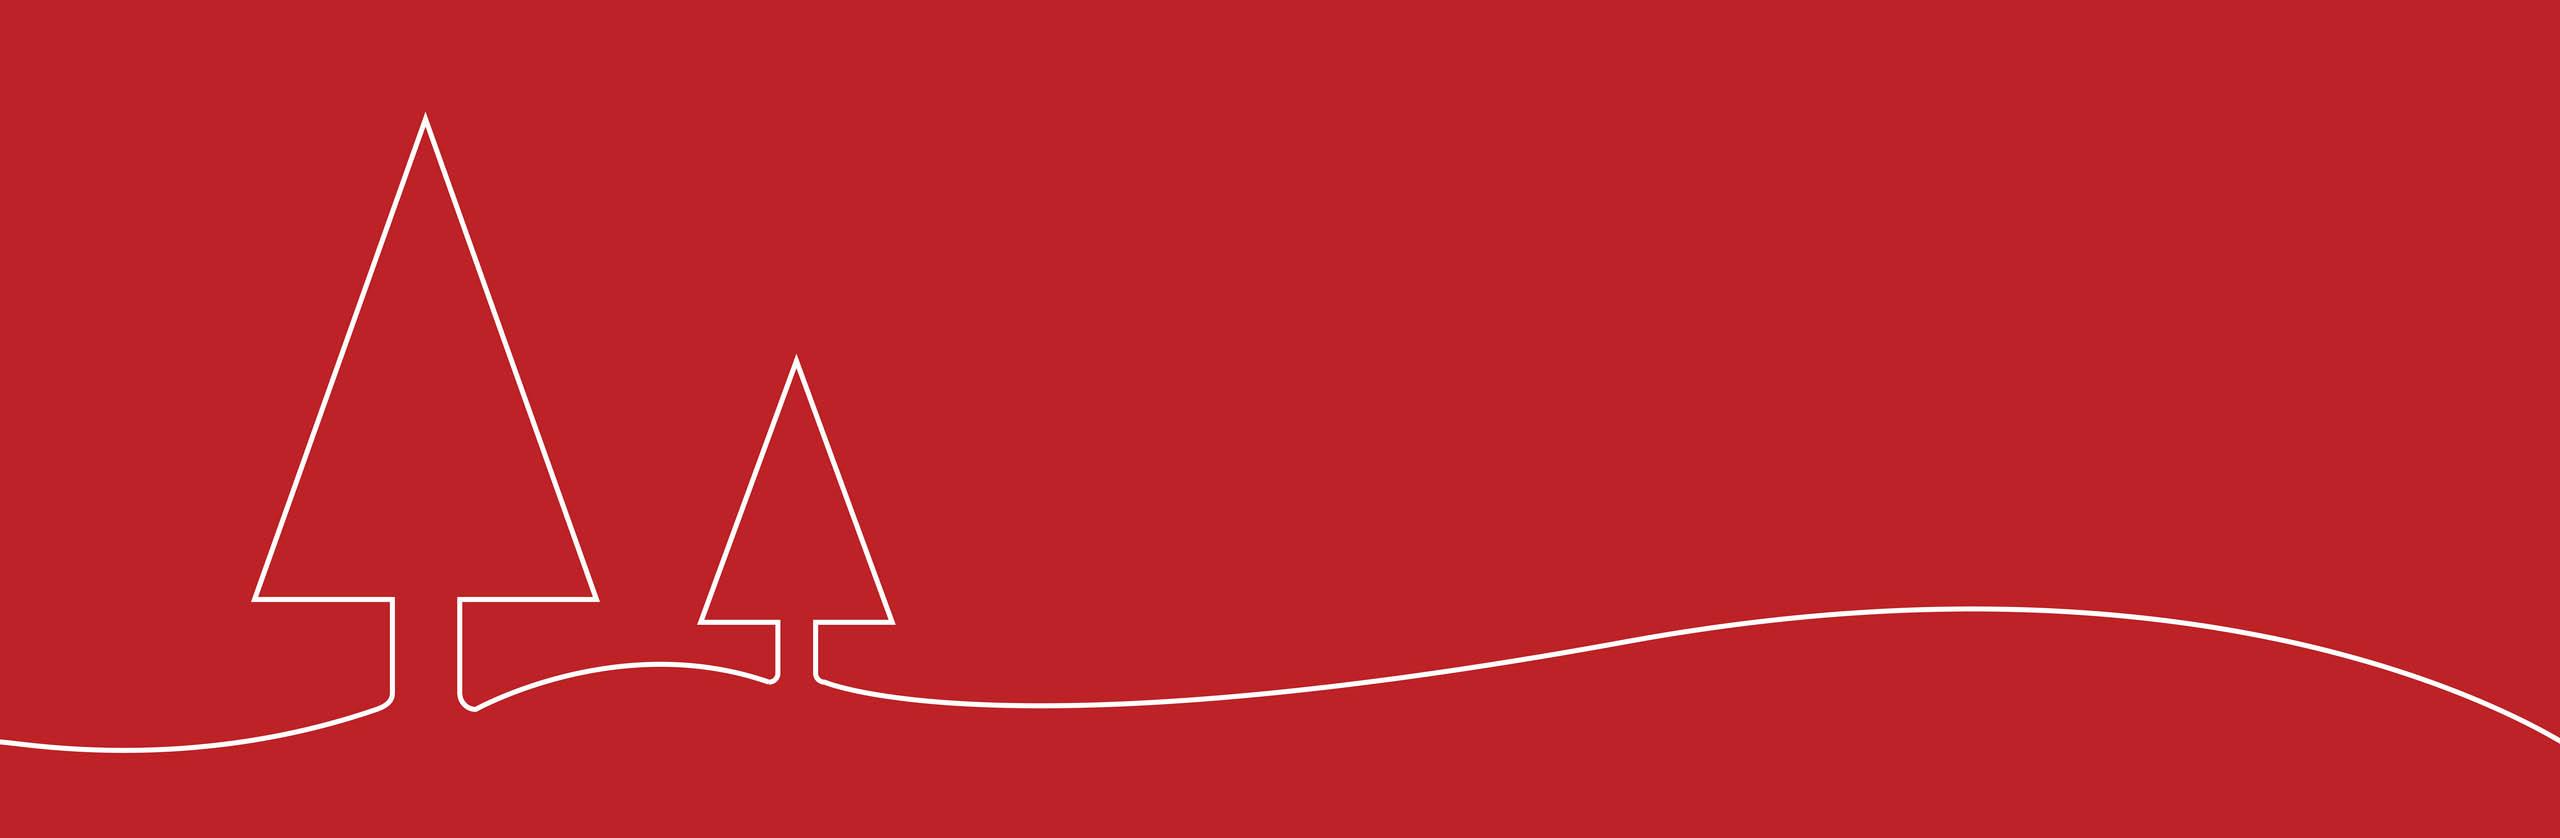 Carrousel-3-Fond-rouge-1 copie